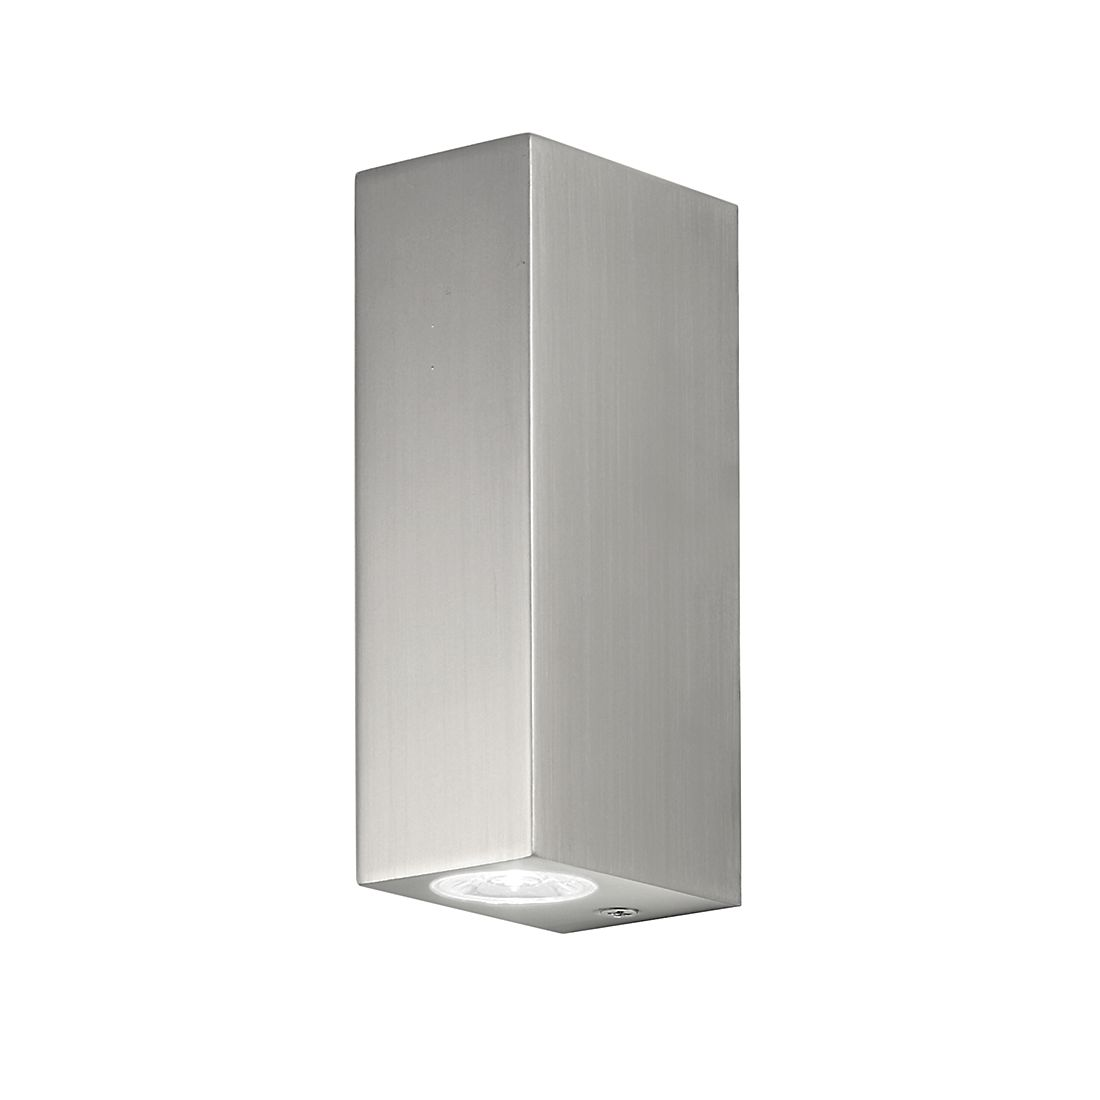 energie  A+, Buitenlamp Bloc MK2- mat nikkel - 2 lichtbronnen, Illumina